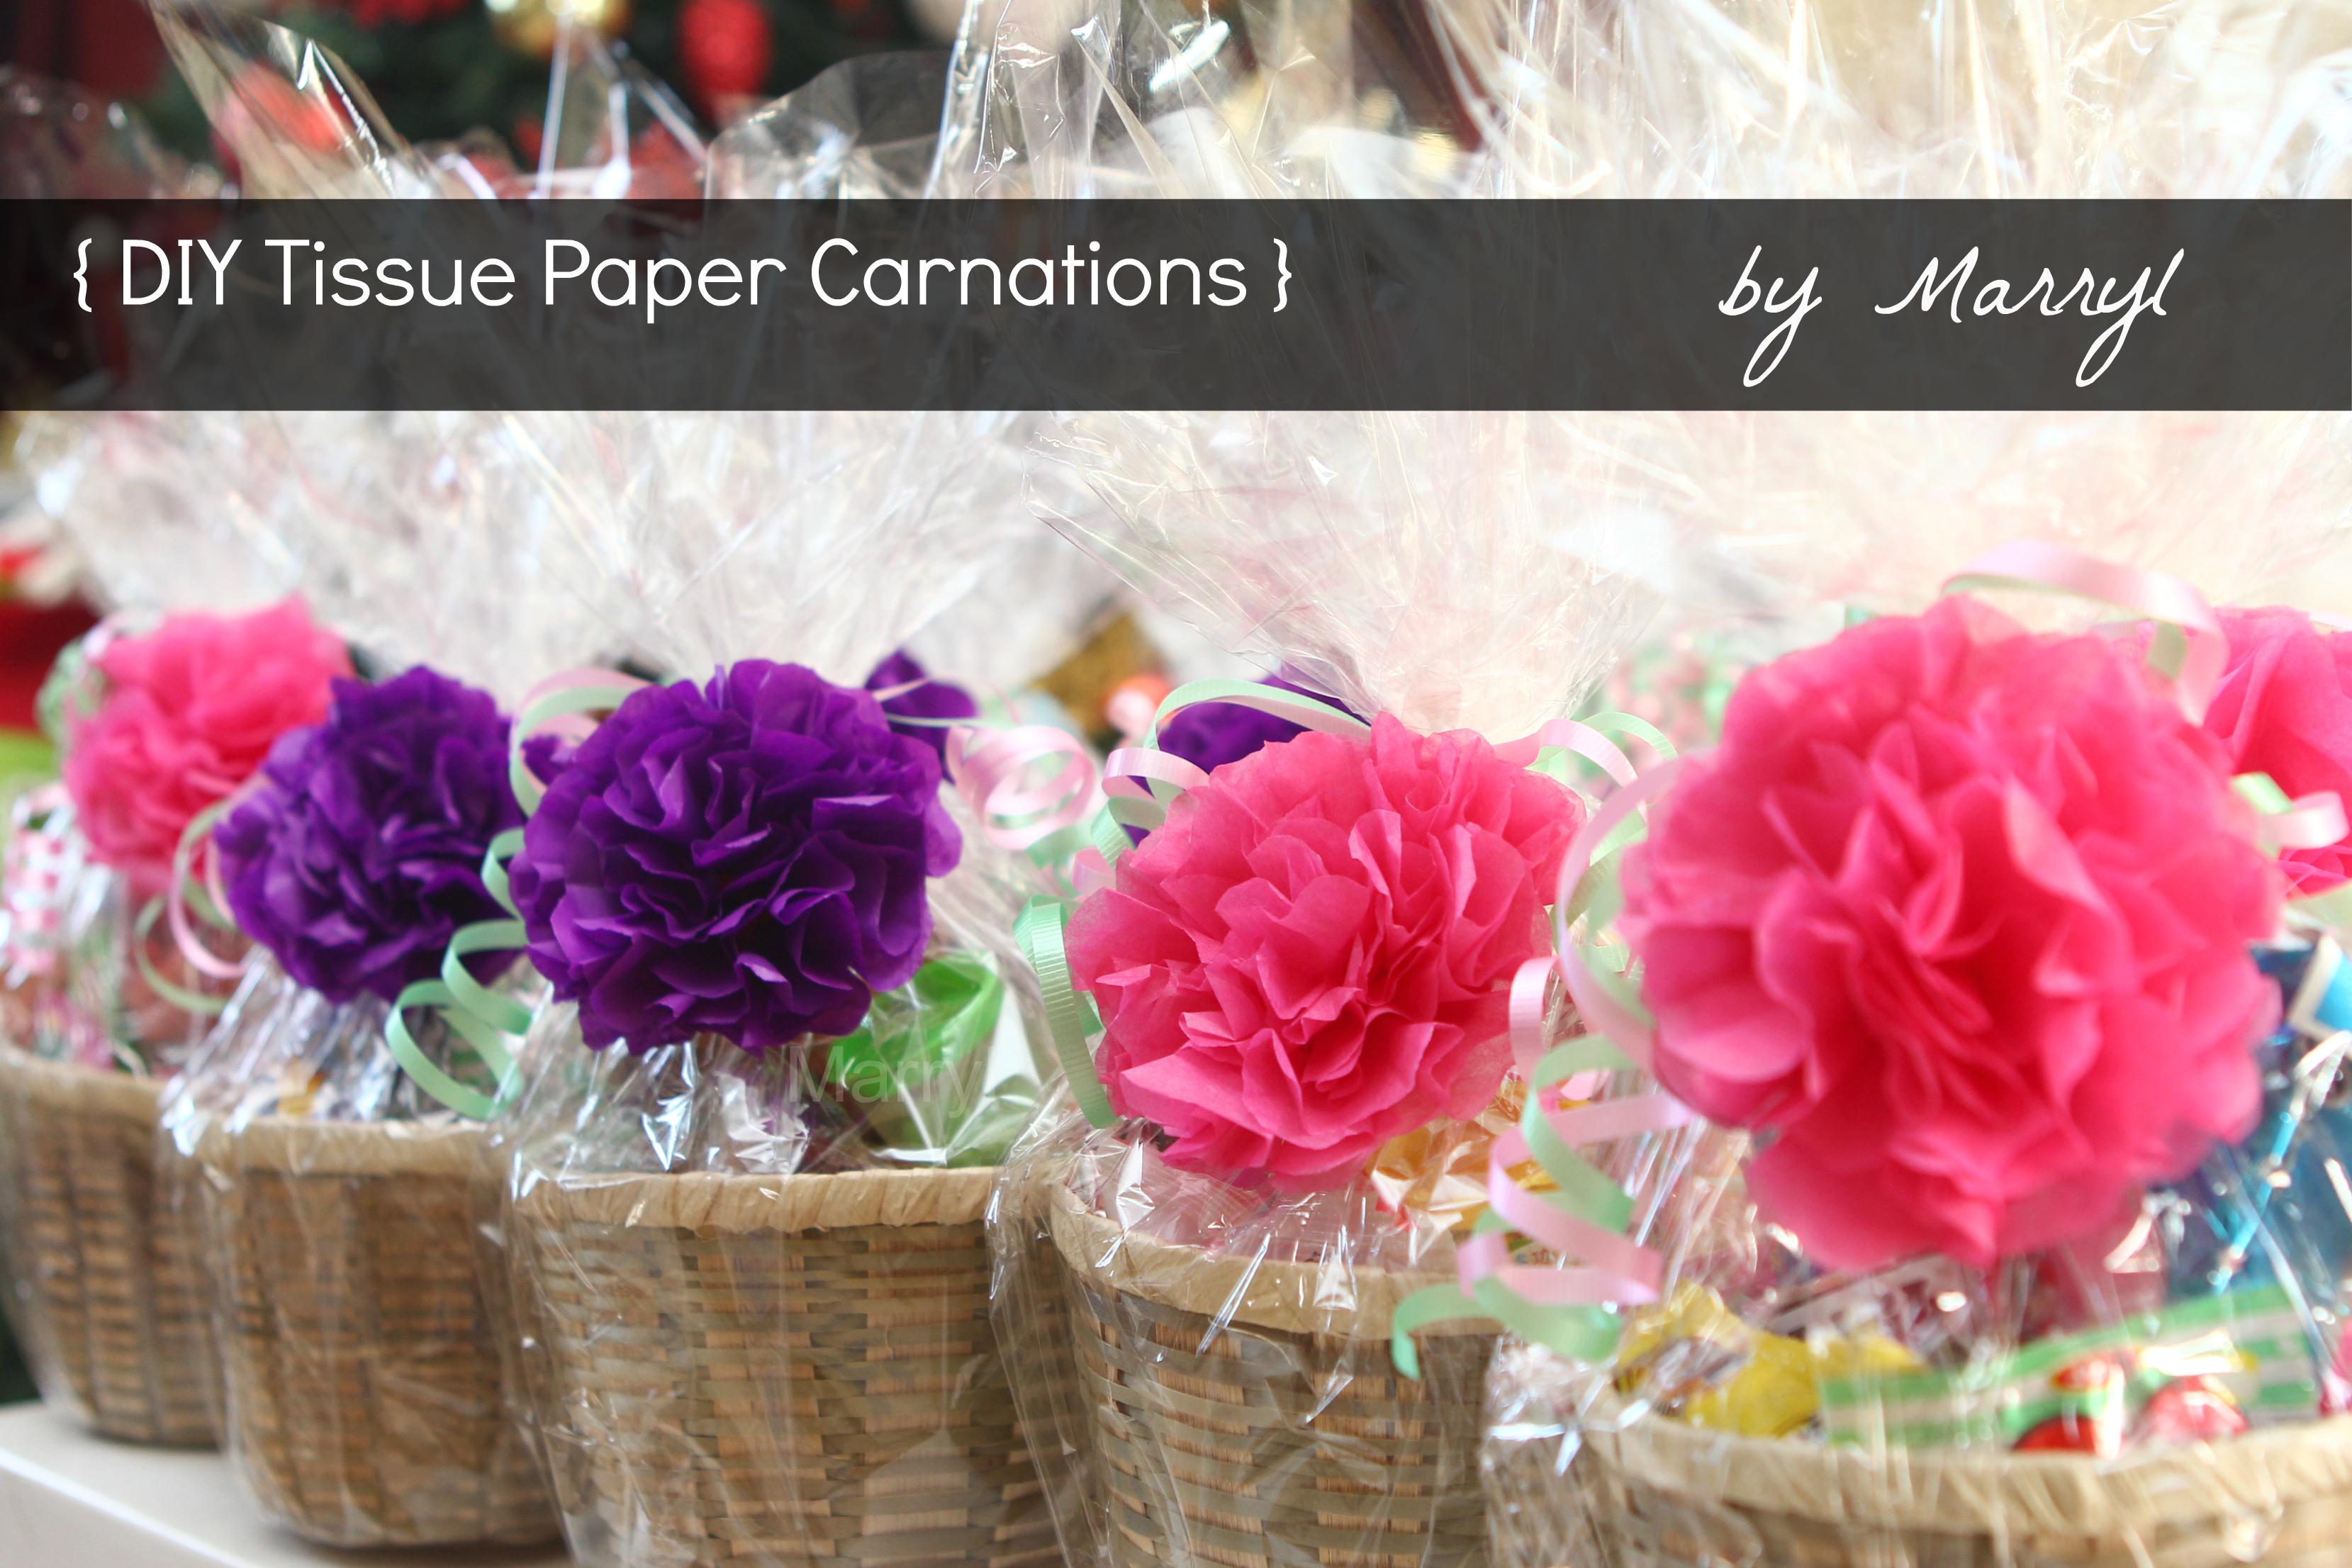 Diy Tissue Paper Carnations Marryl Crafts